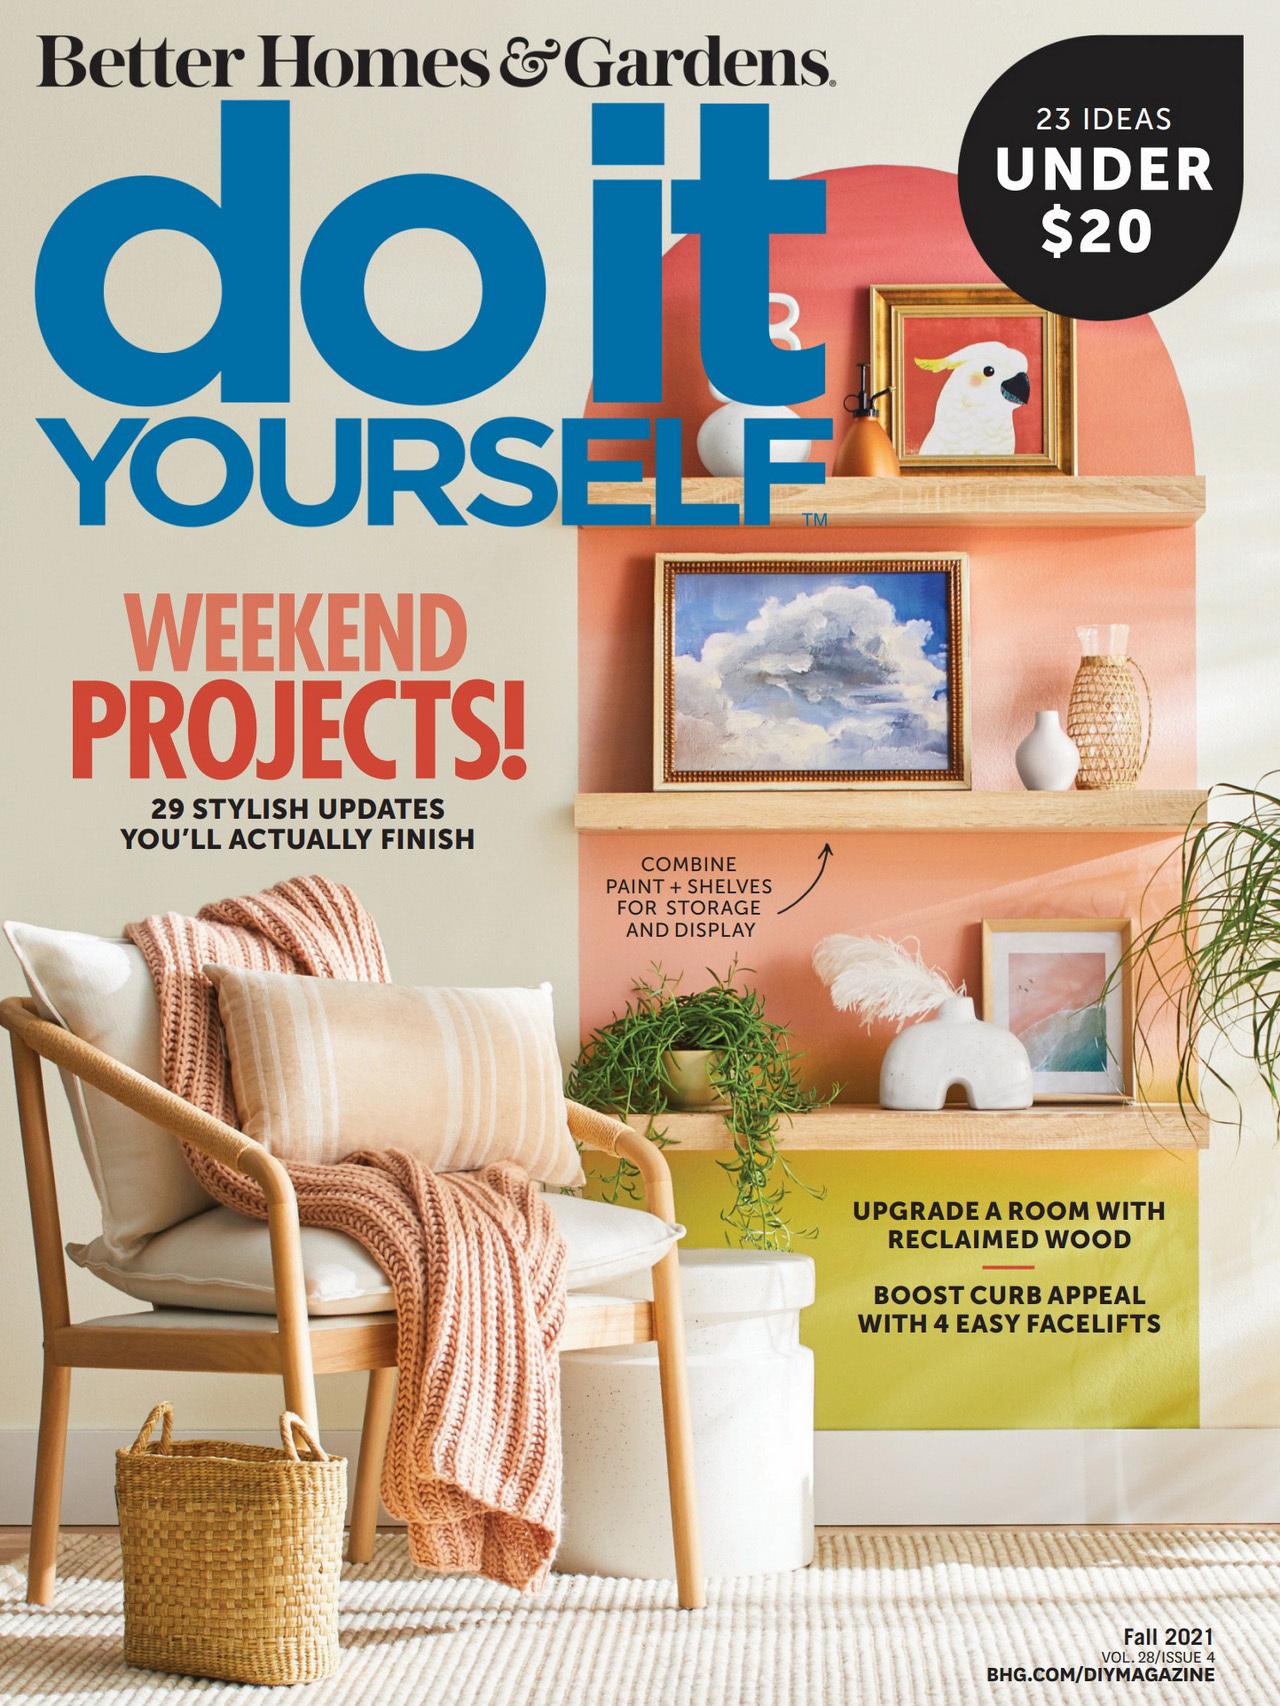 《Do It Yourself》美国时尚家居杂志2021年秋季号